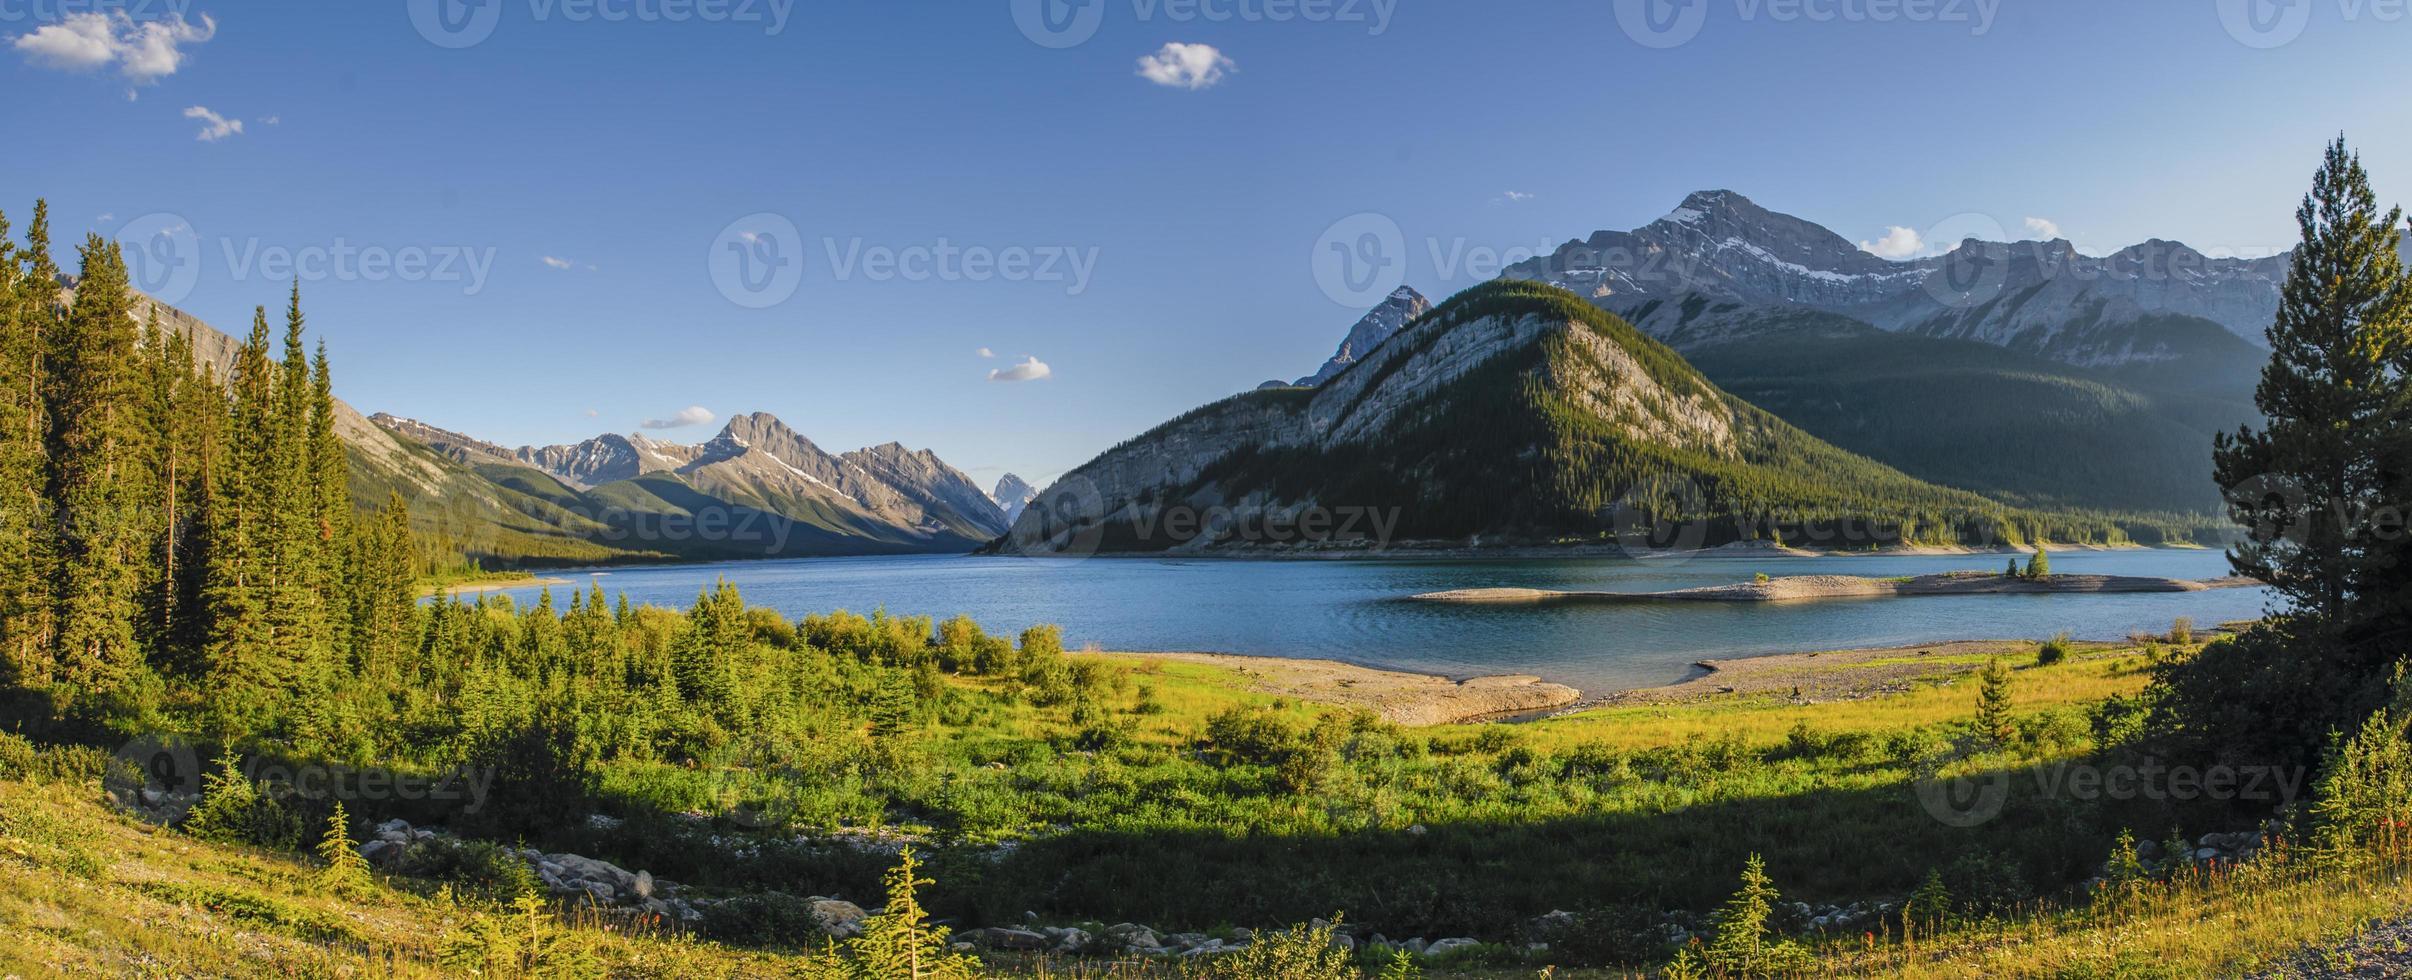 sommar i bergen foto